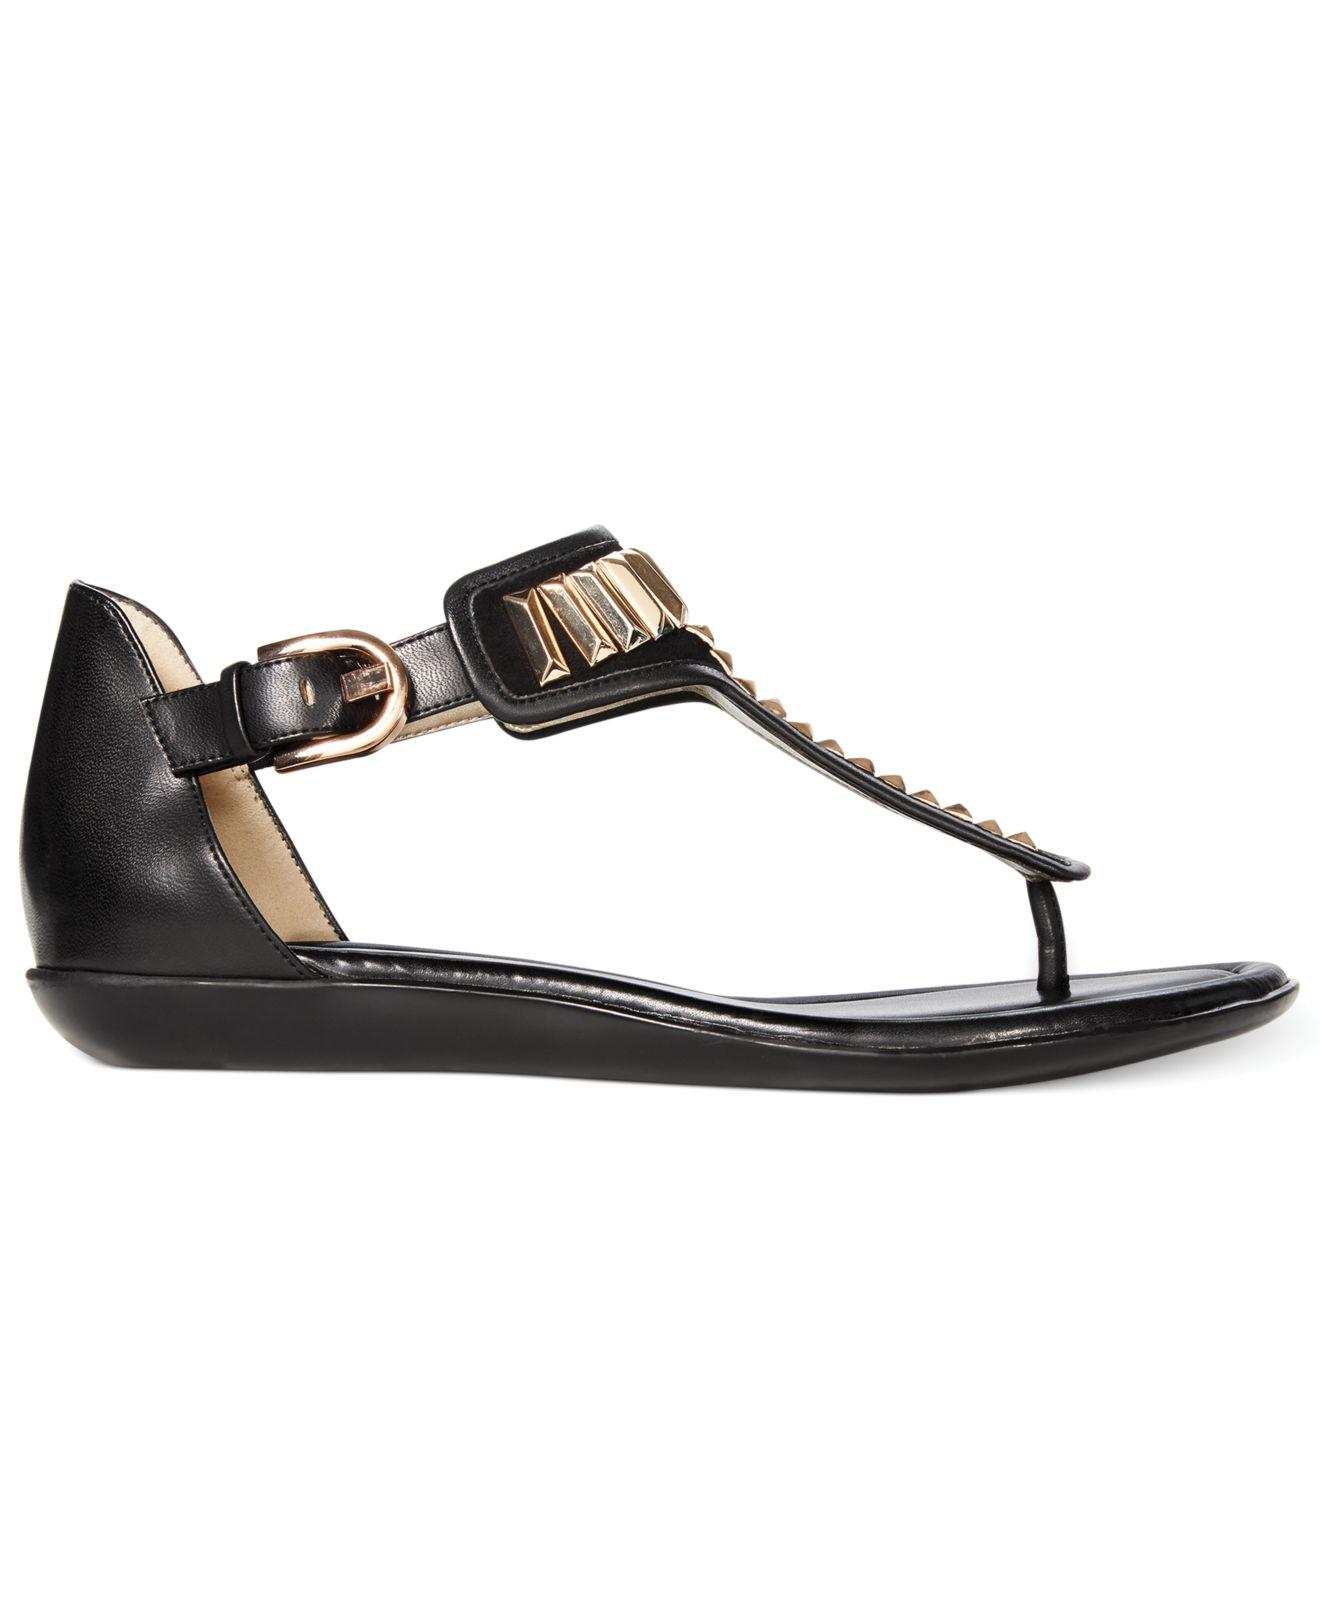 Bandolino Shoes Flats